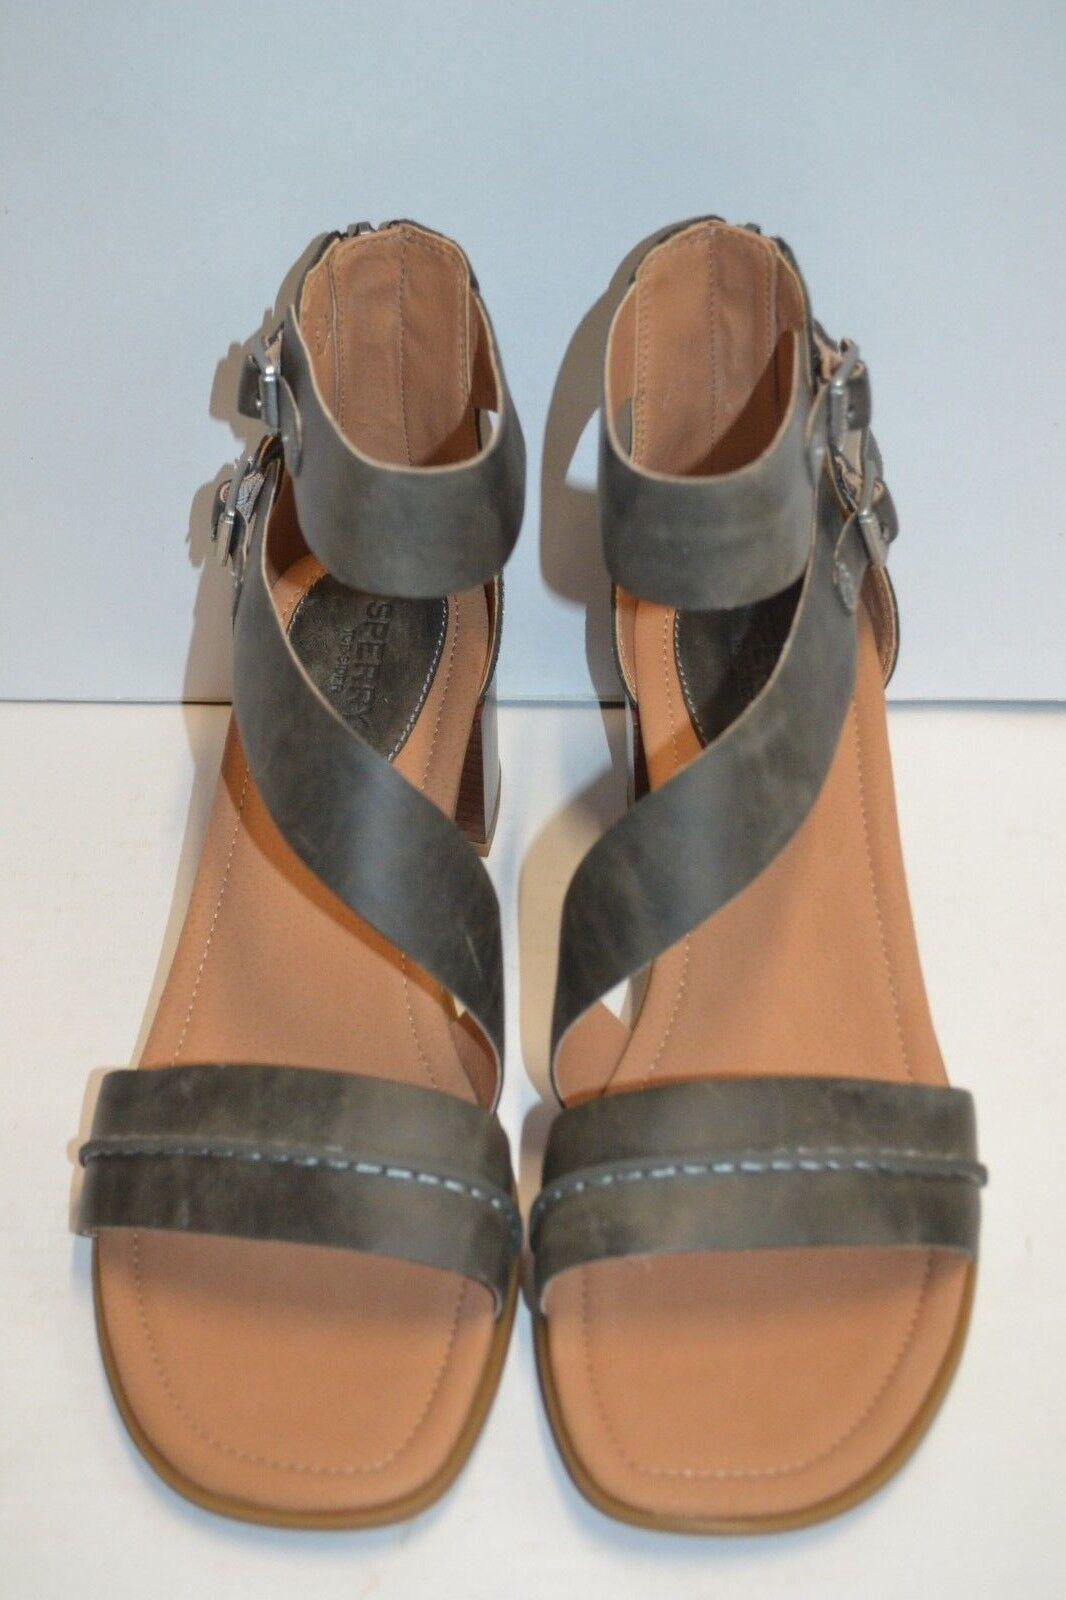 Sperry Top-Sider damen LEATHER Adelia York grau Heeled Heeled grau Sandal schuhe BUCKLE 12 M 270526